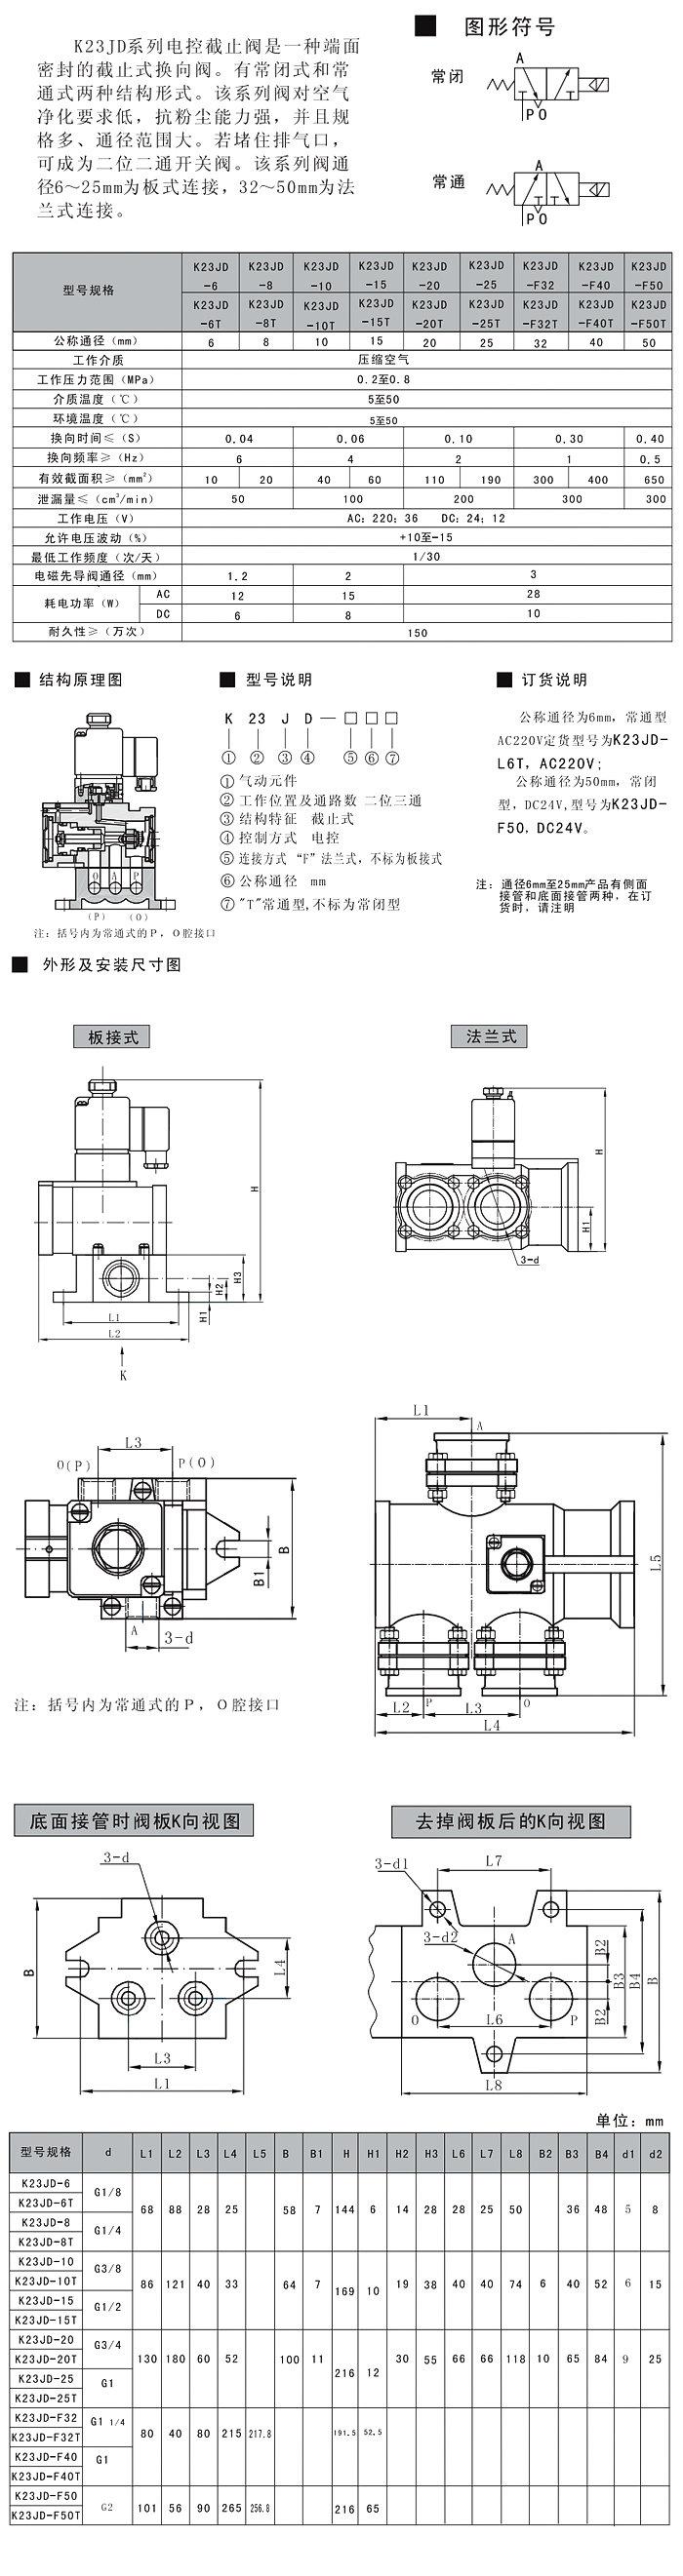 K23JD-8-F50.jpg